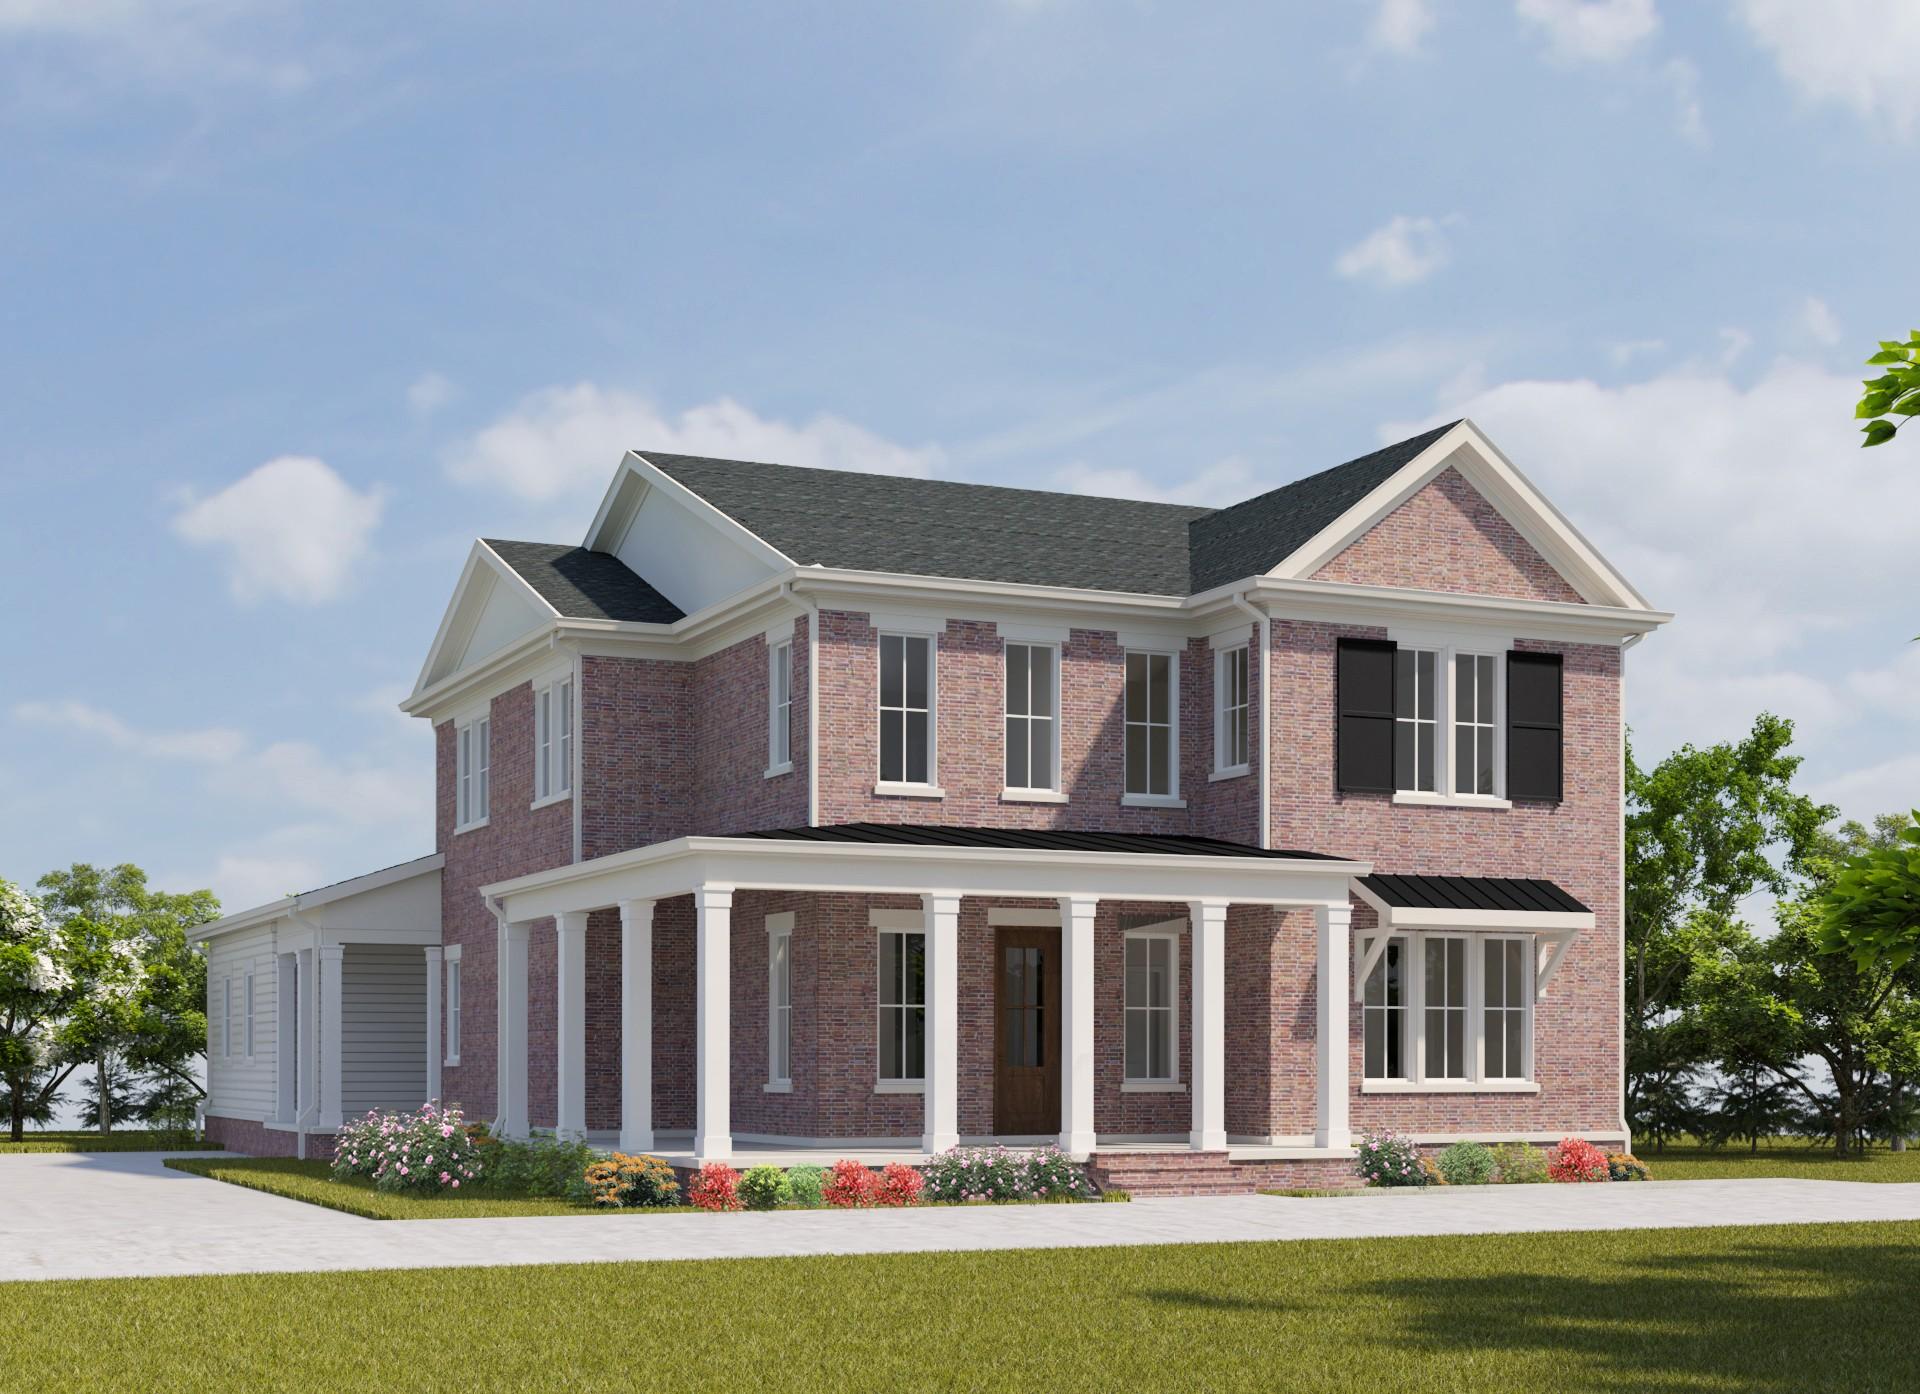 336 Azalea Cir, Hendersonville, TN 37075 - Hendersonville, TN real estate listing